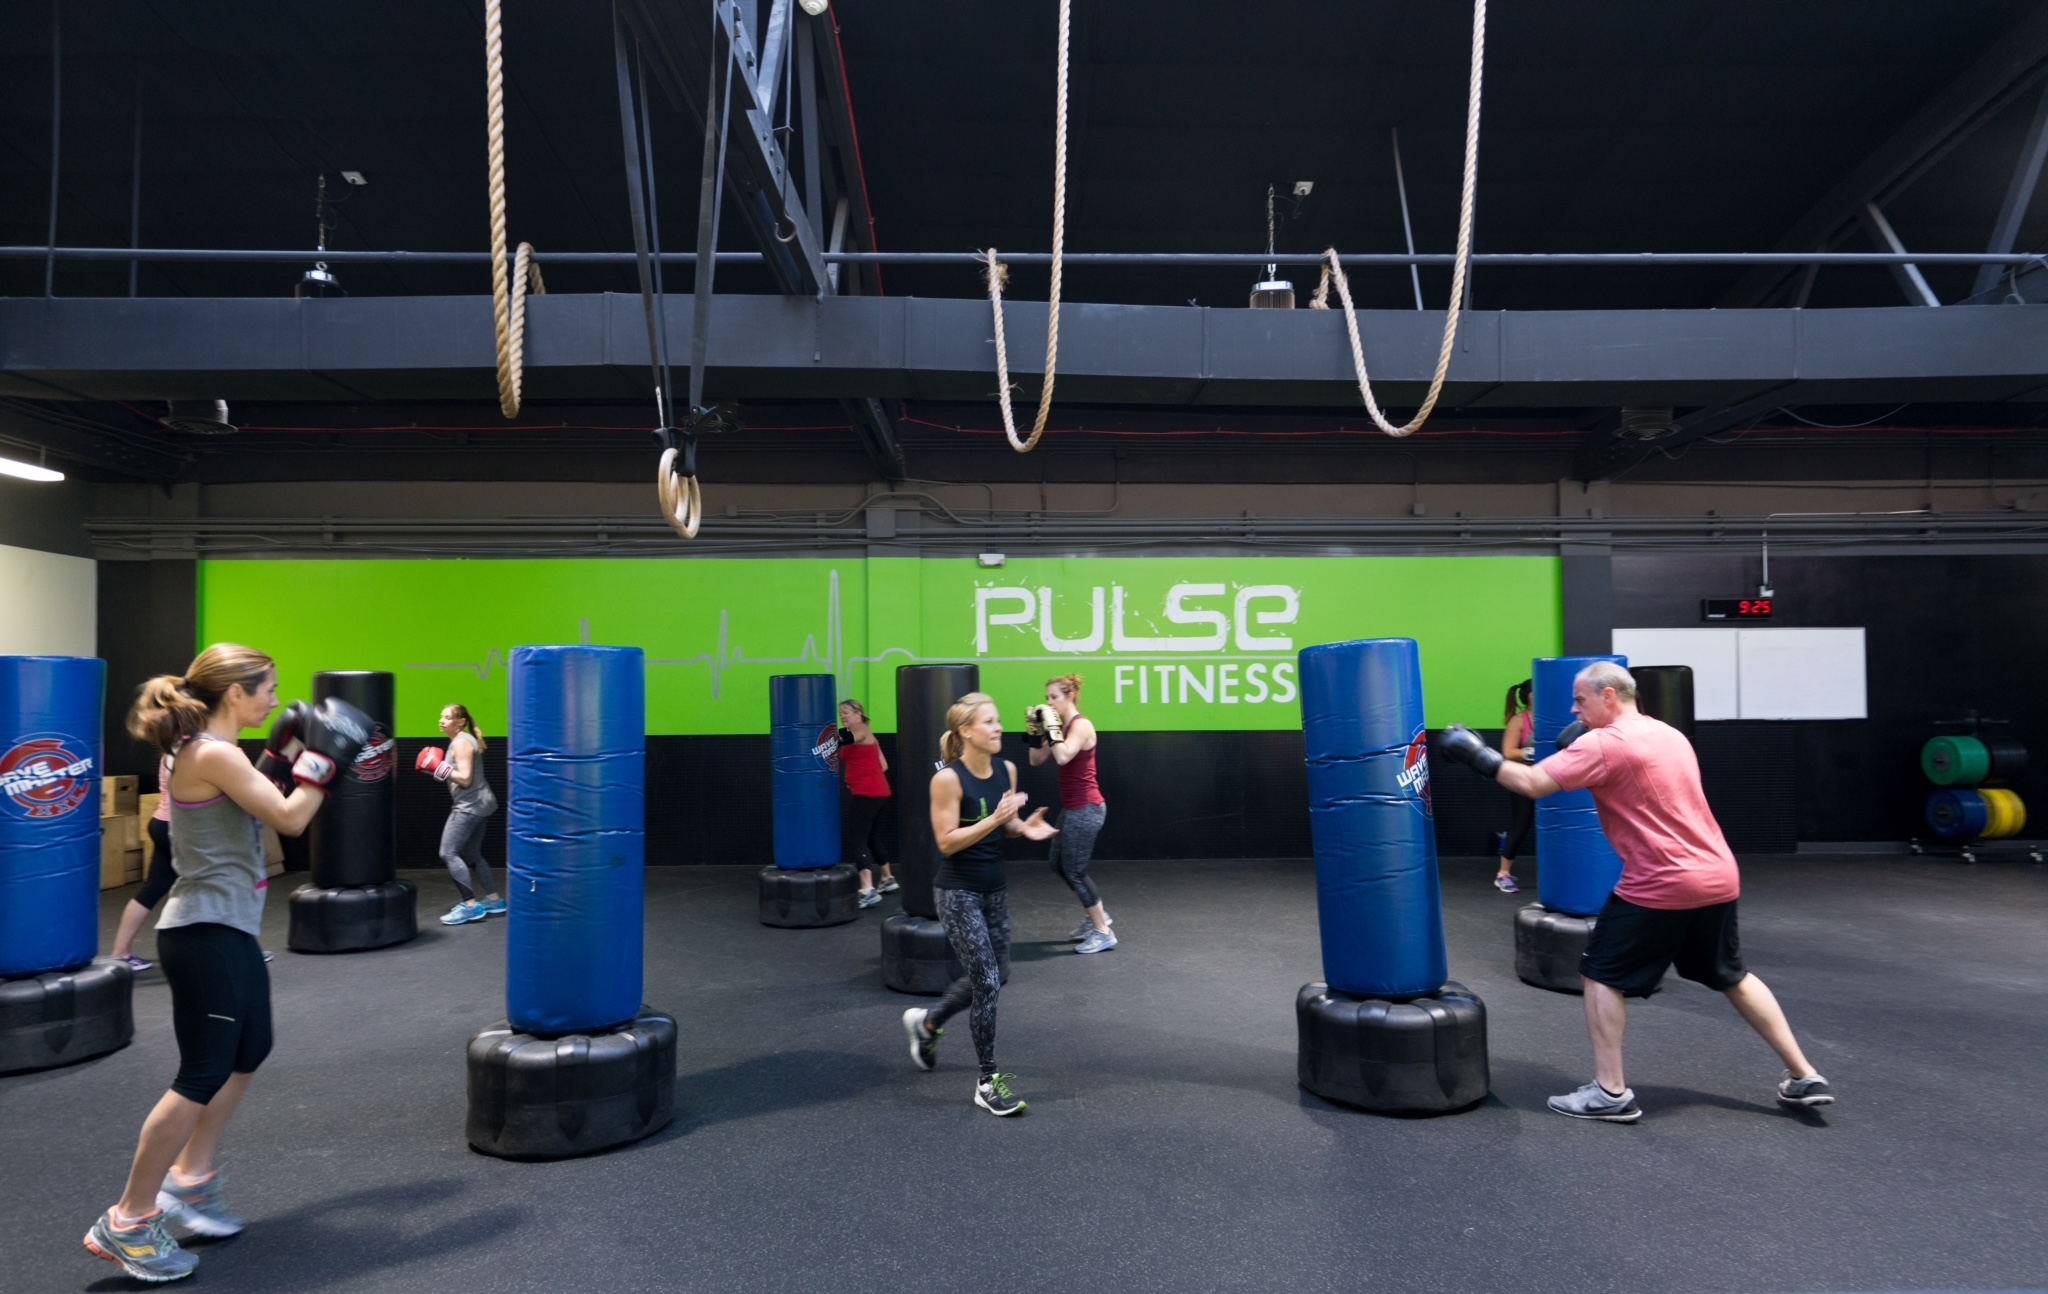 Pulse Boxing Club Amp Fitness Highland Park Illinois Il